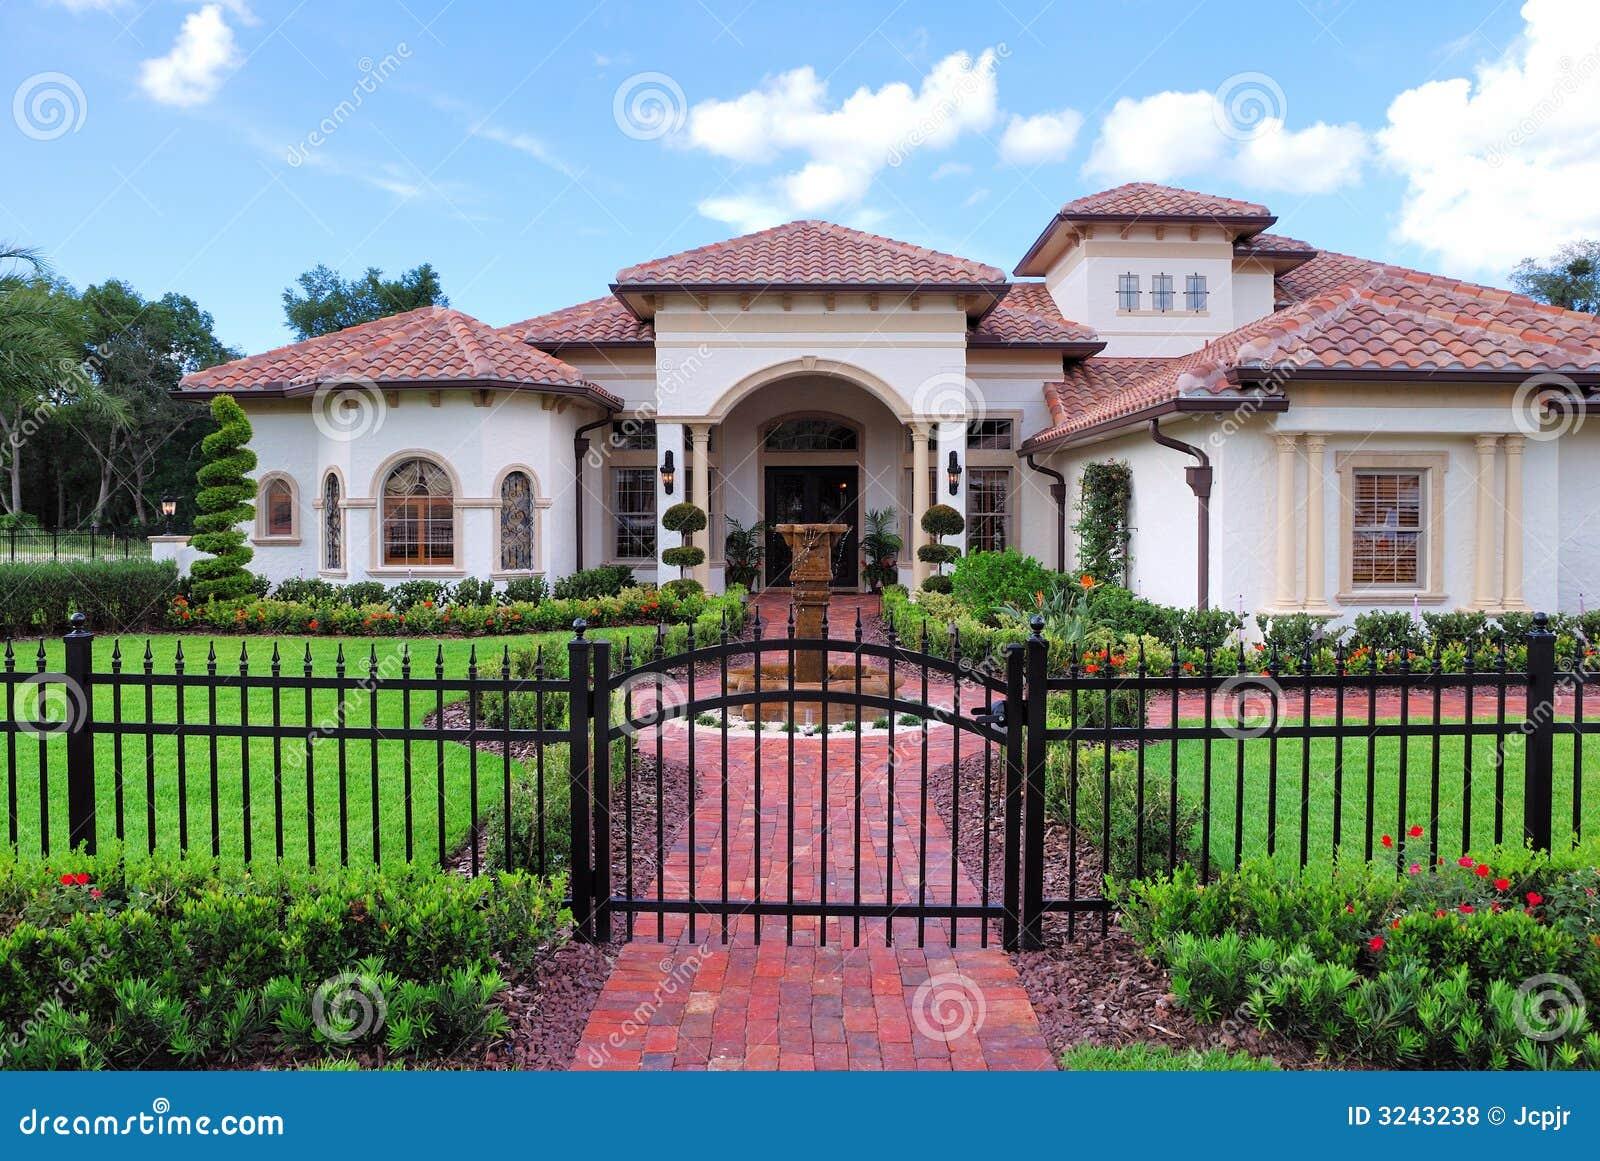 Real Estate stock photo. Image of sale, landscape, home ...